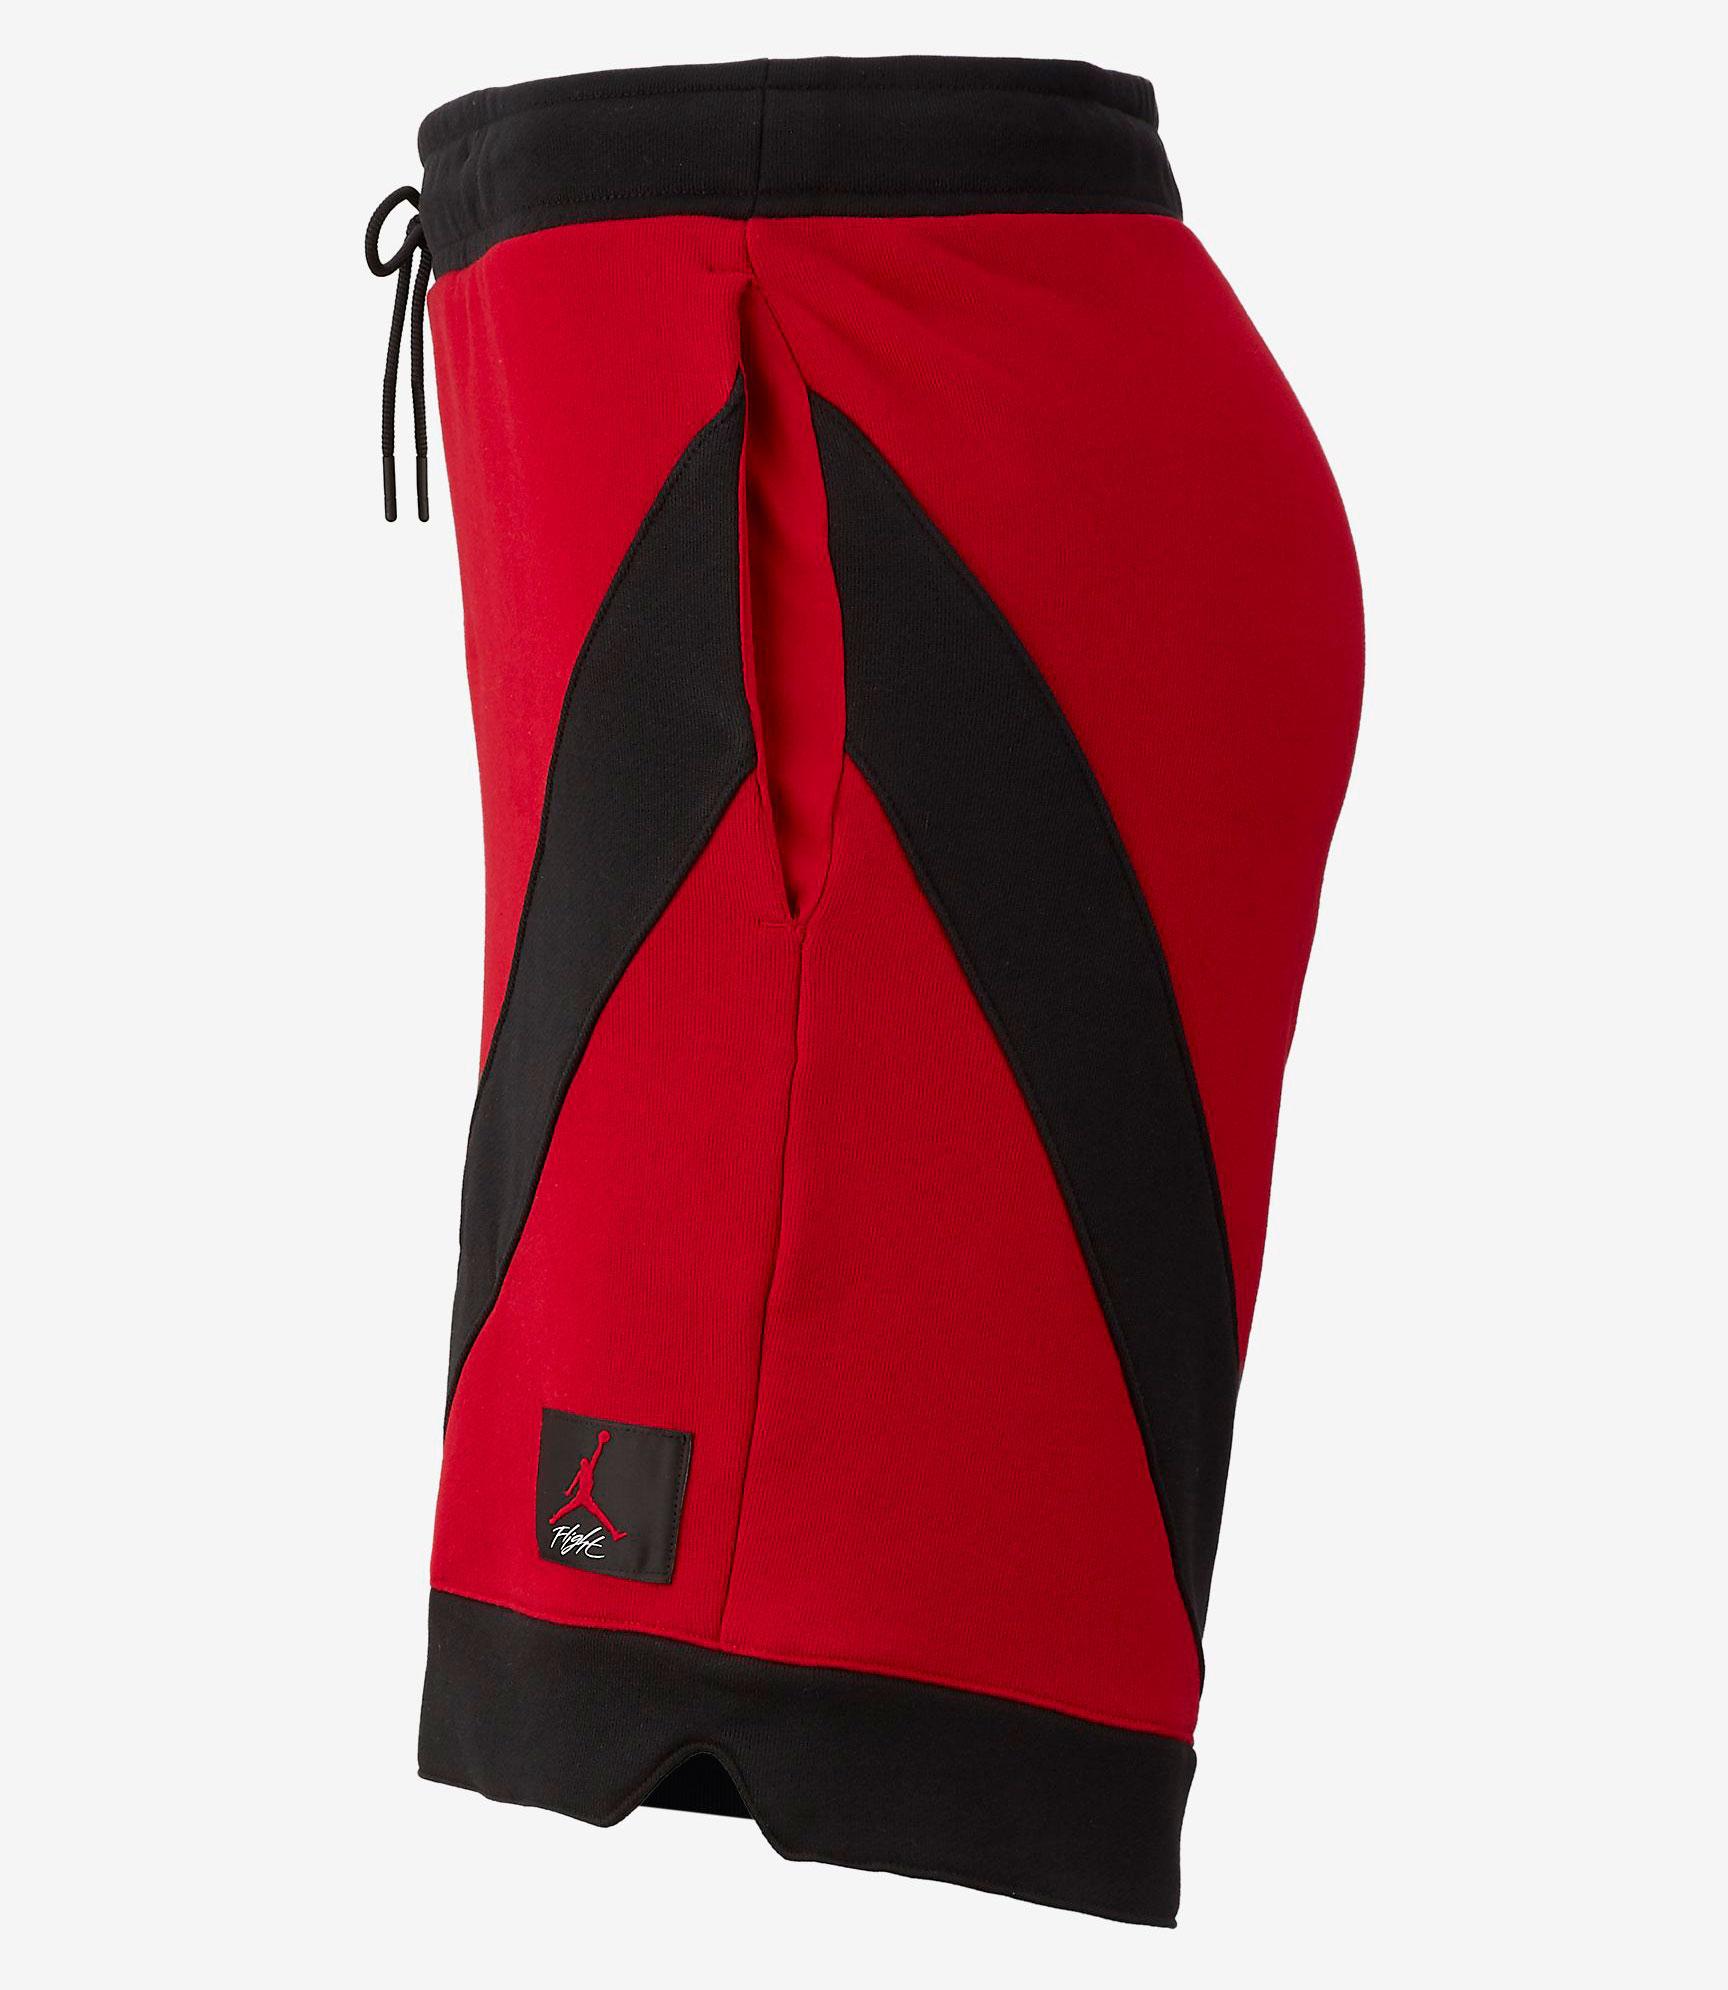 air-jordan-4-bred-shorts-match-4